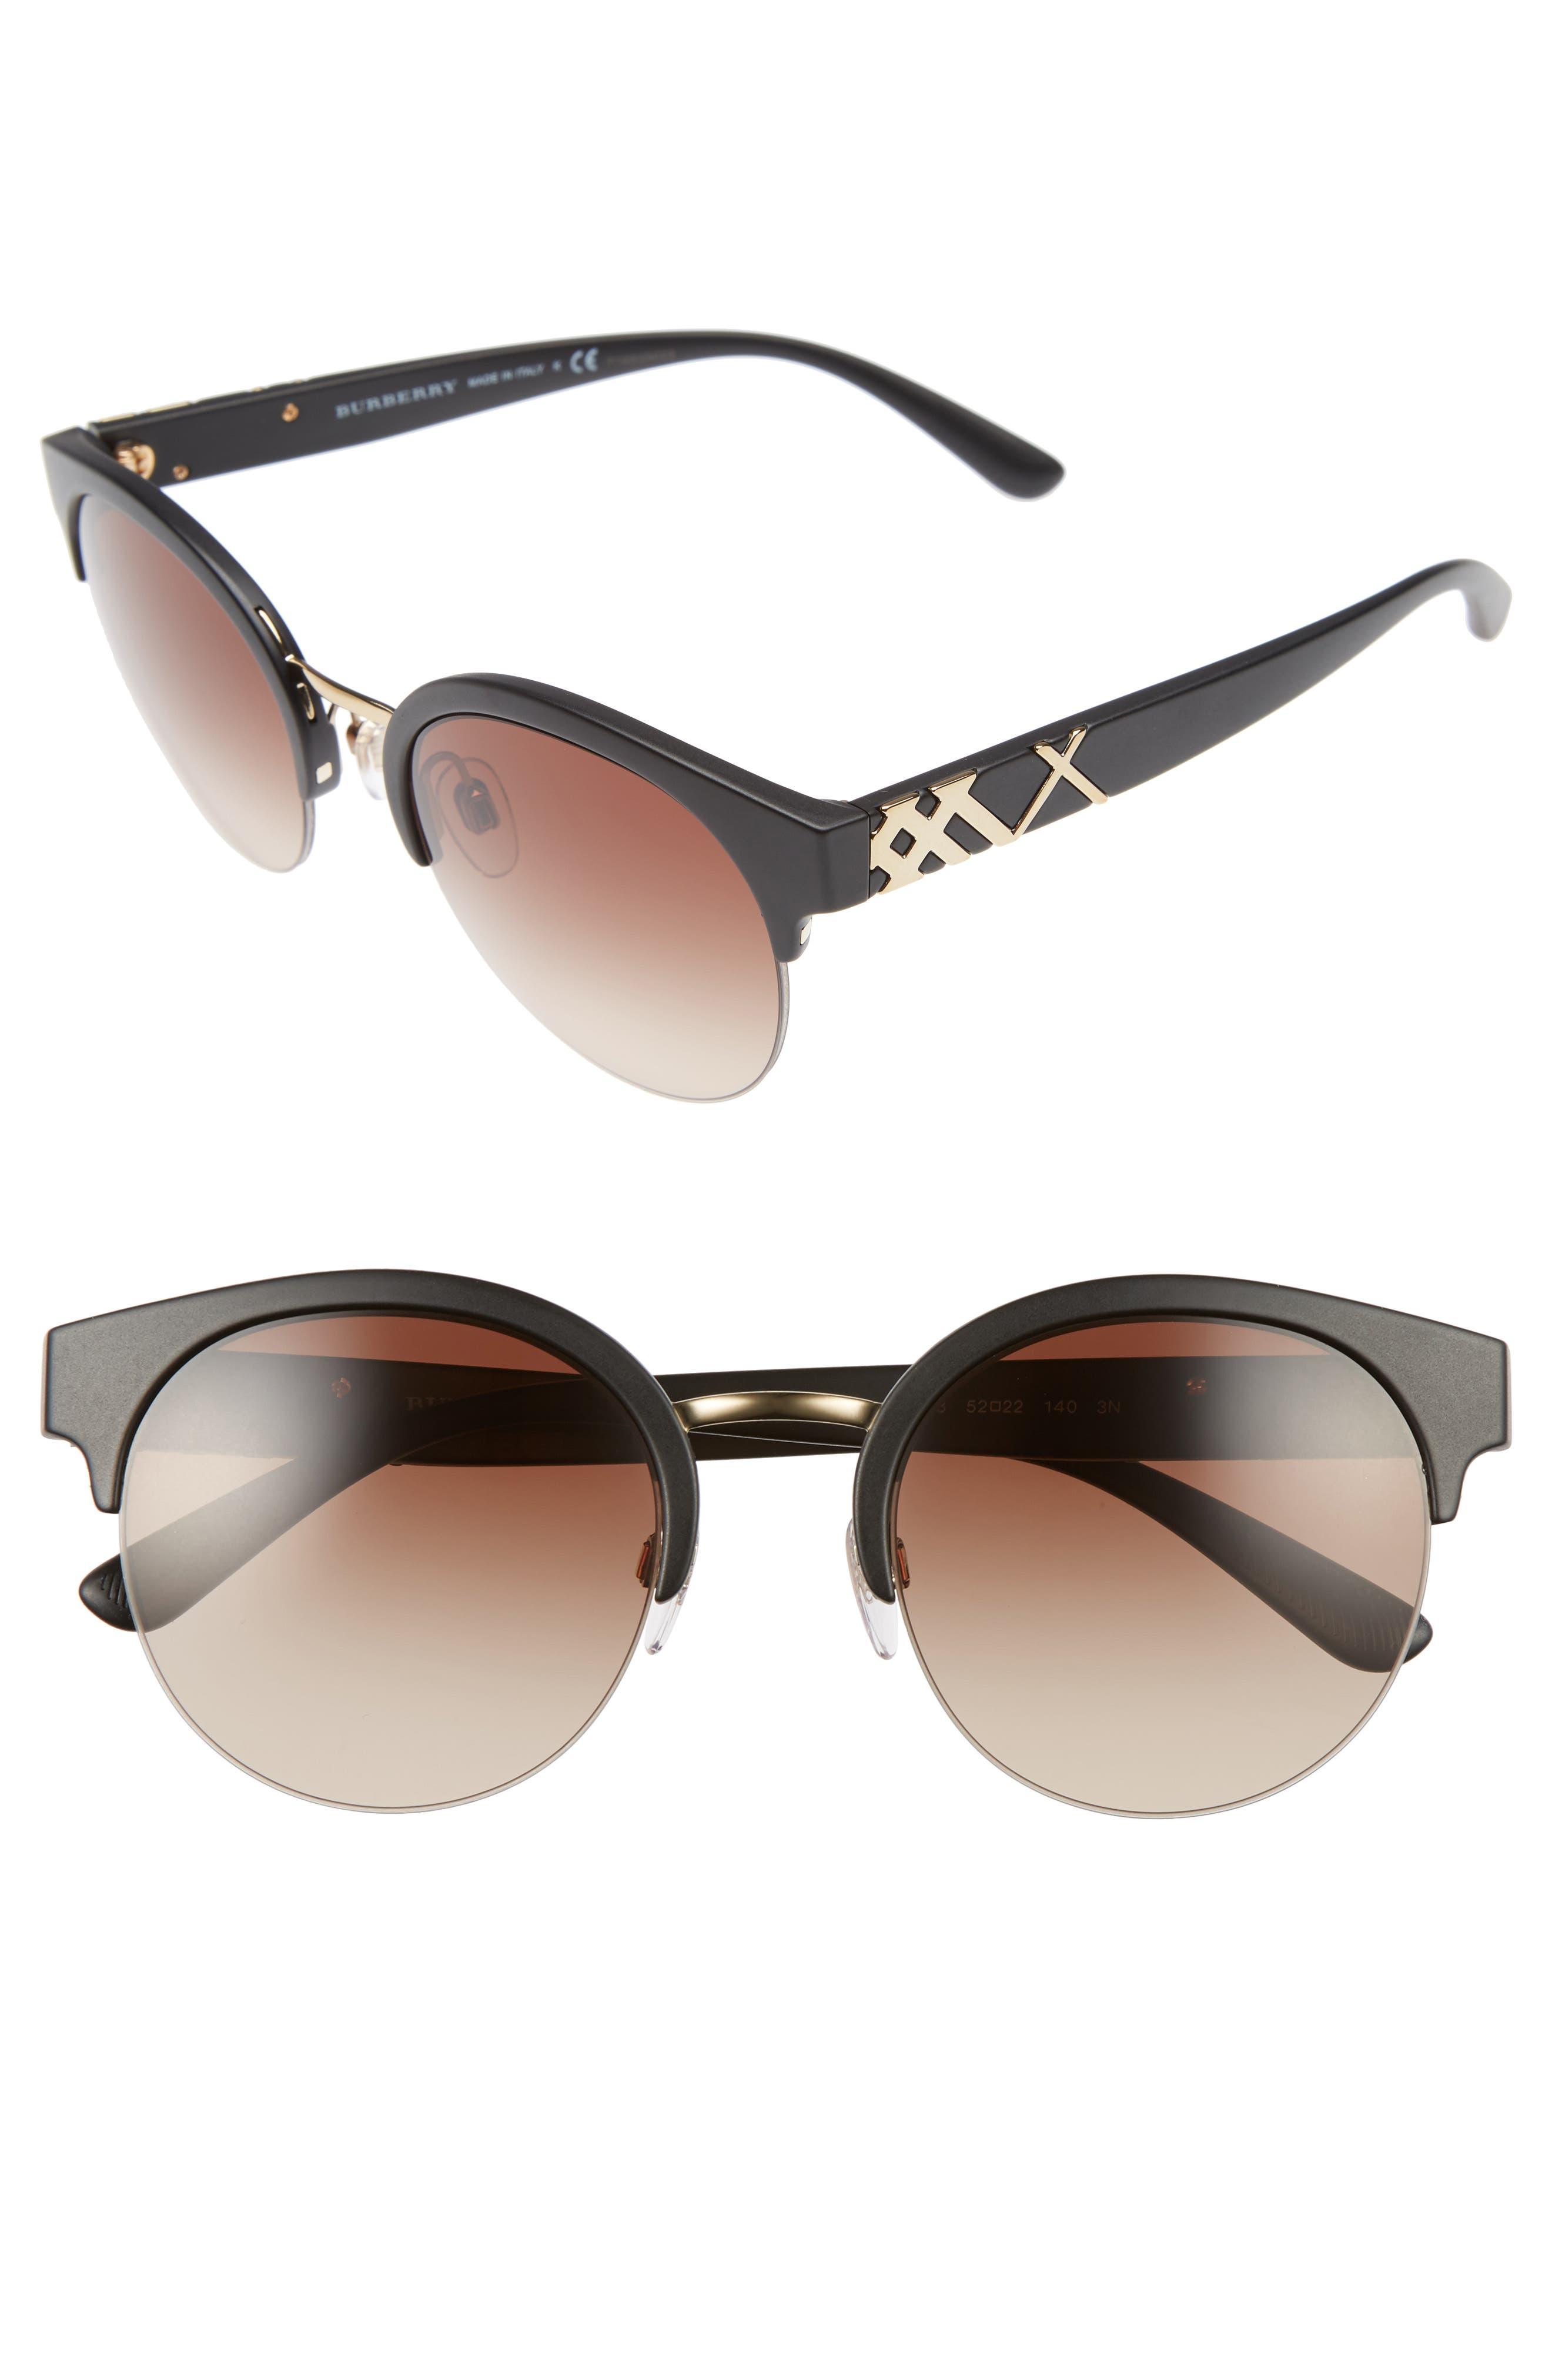 52mm Gradient Semi Rimless Sunglasses,                             Main thumbnail 1, color,